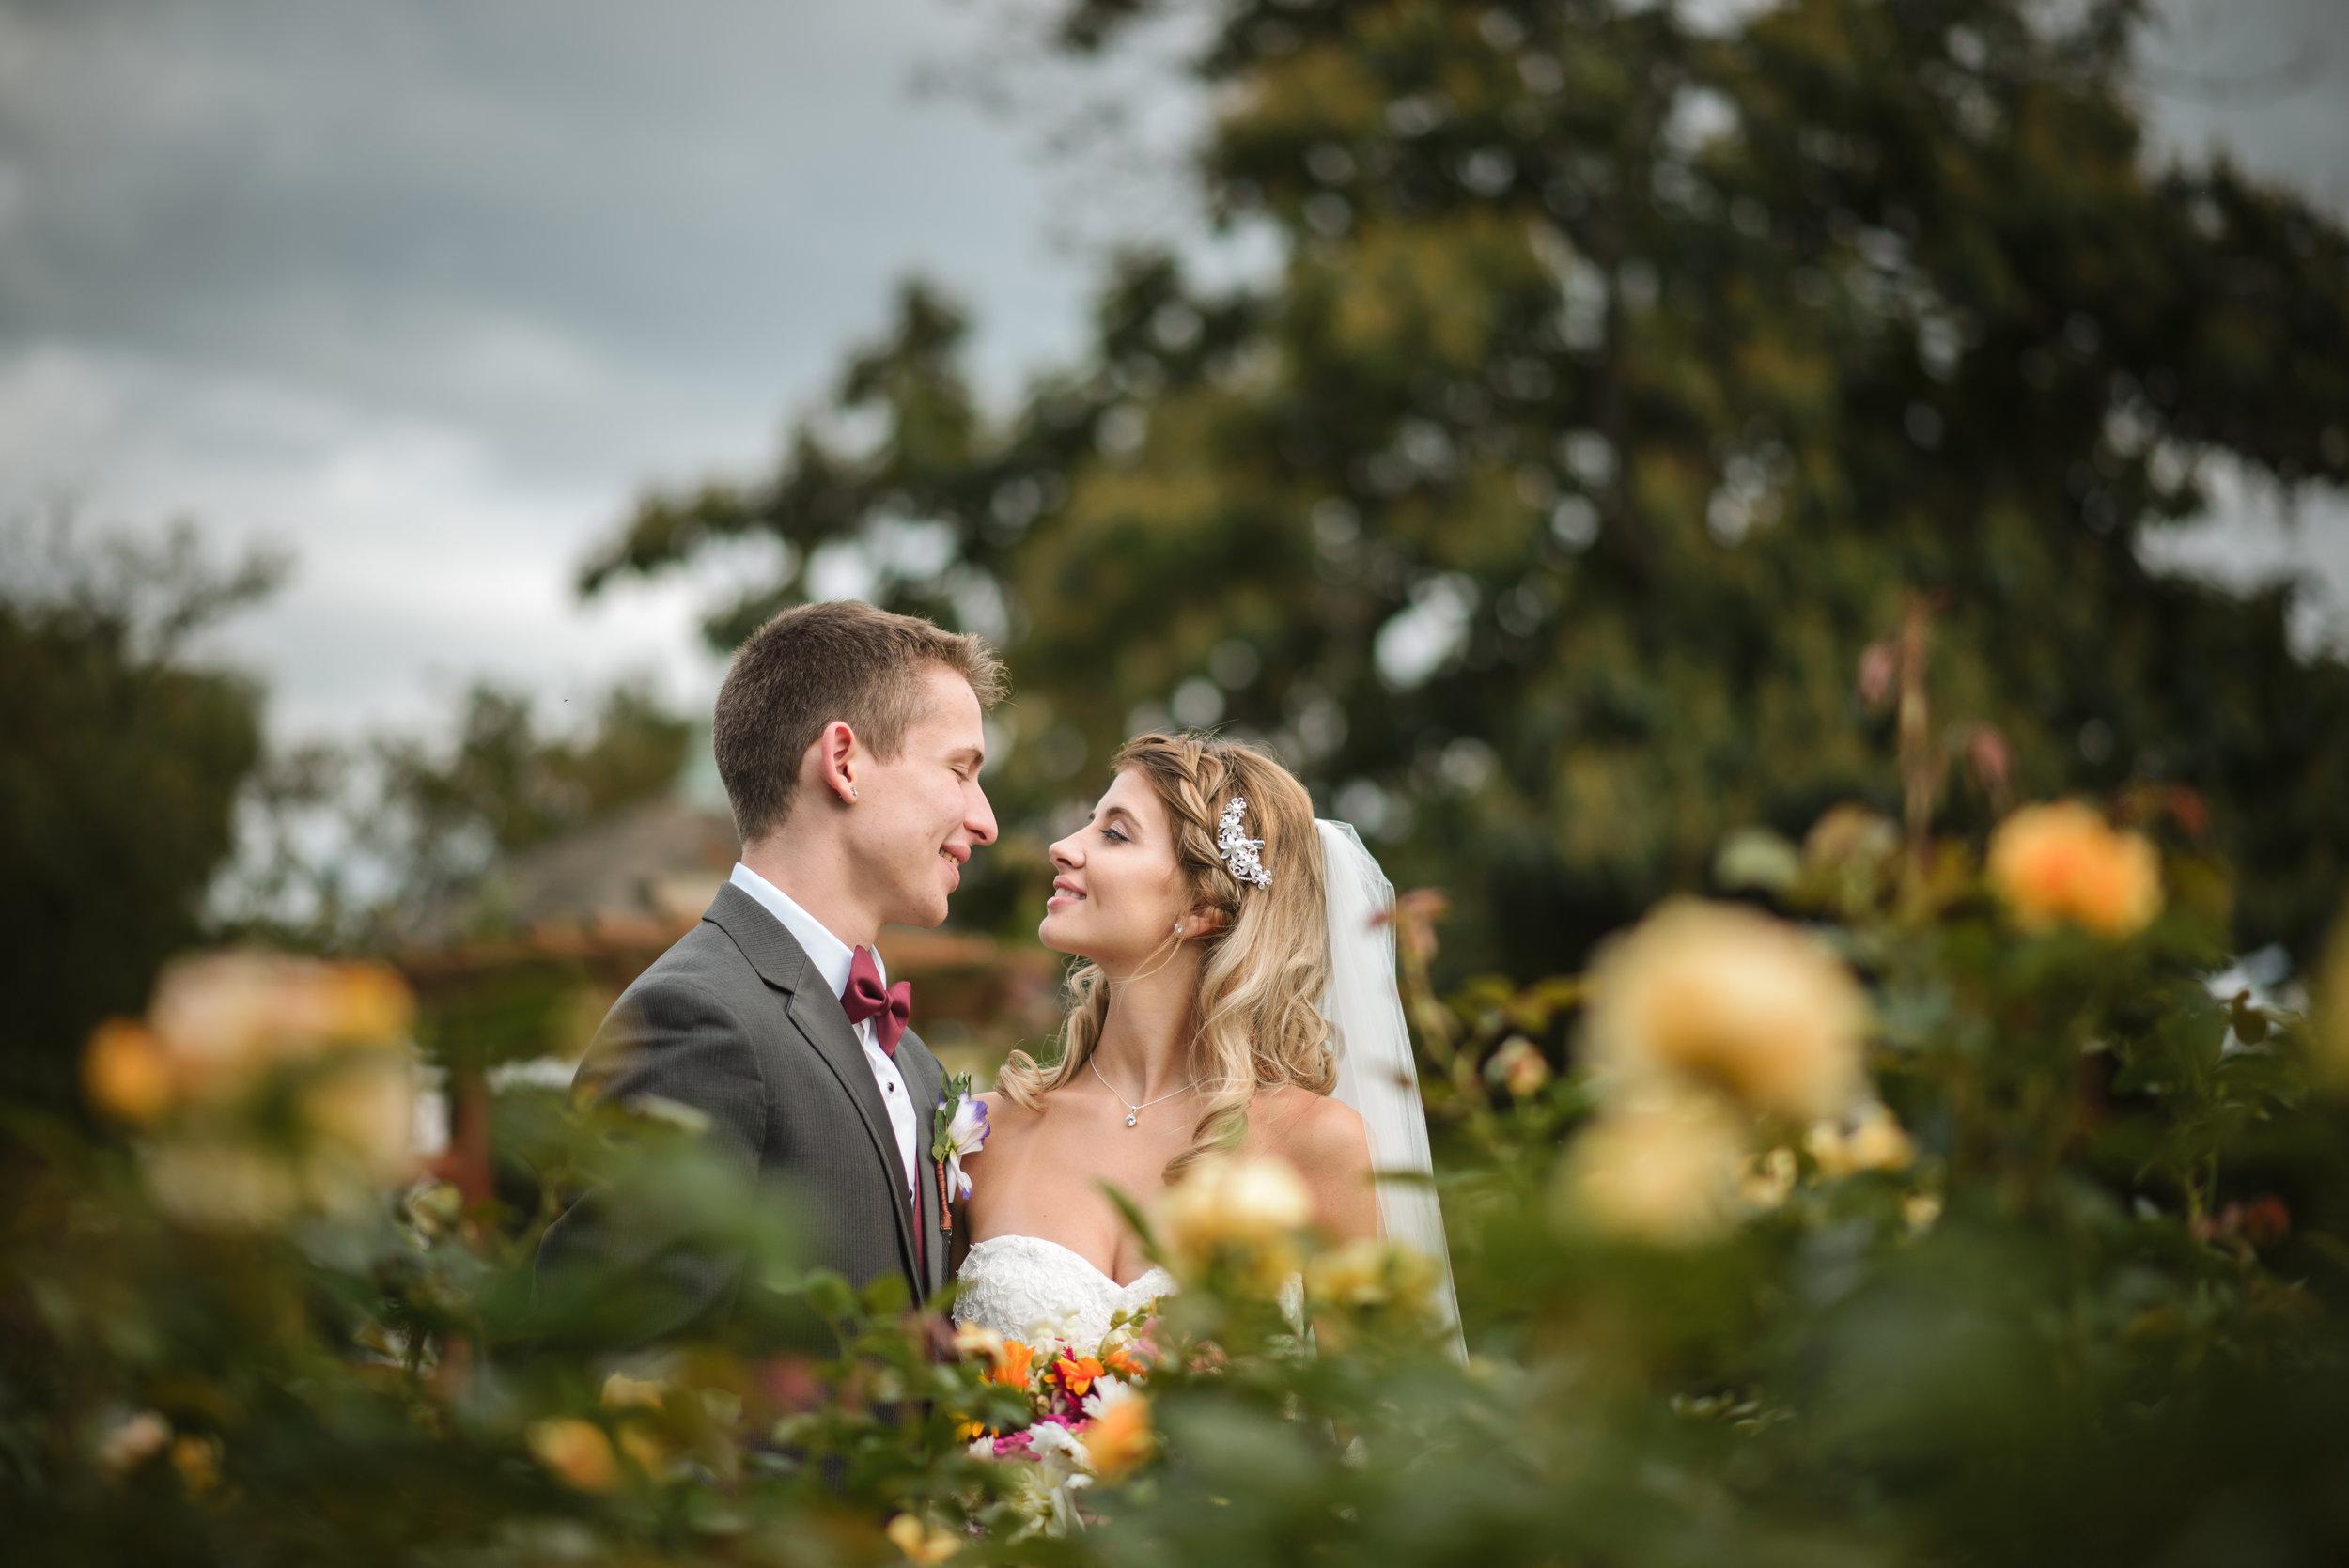 Allentown Rose Gardens Wedding Photographer